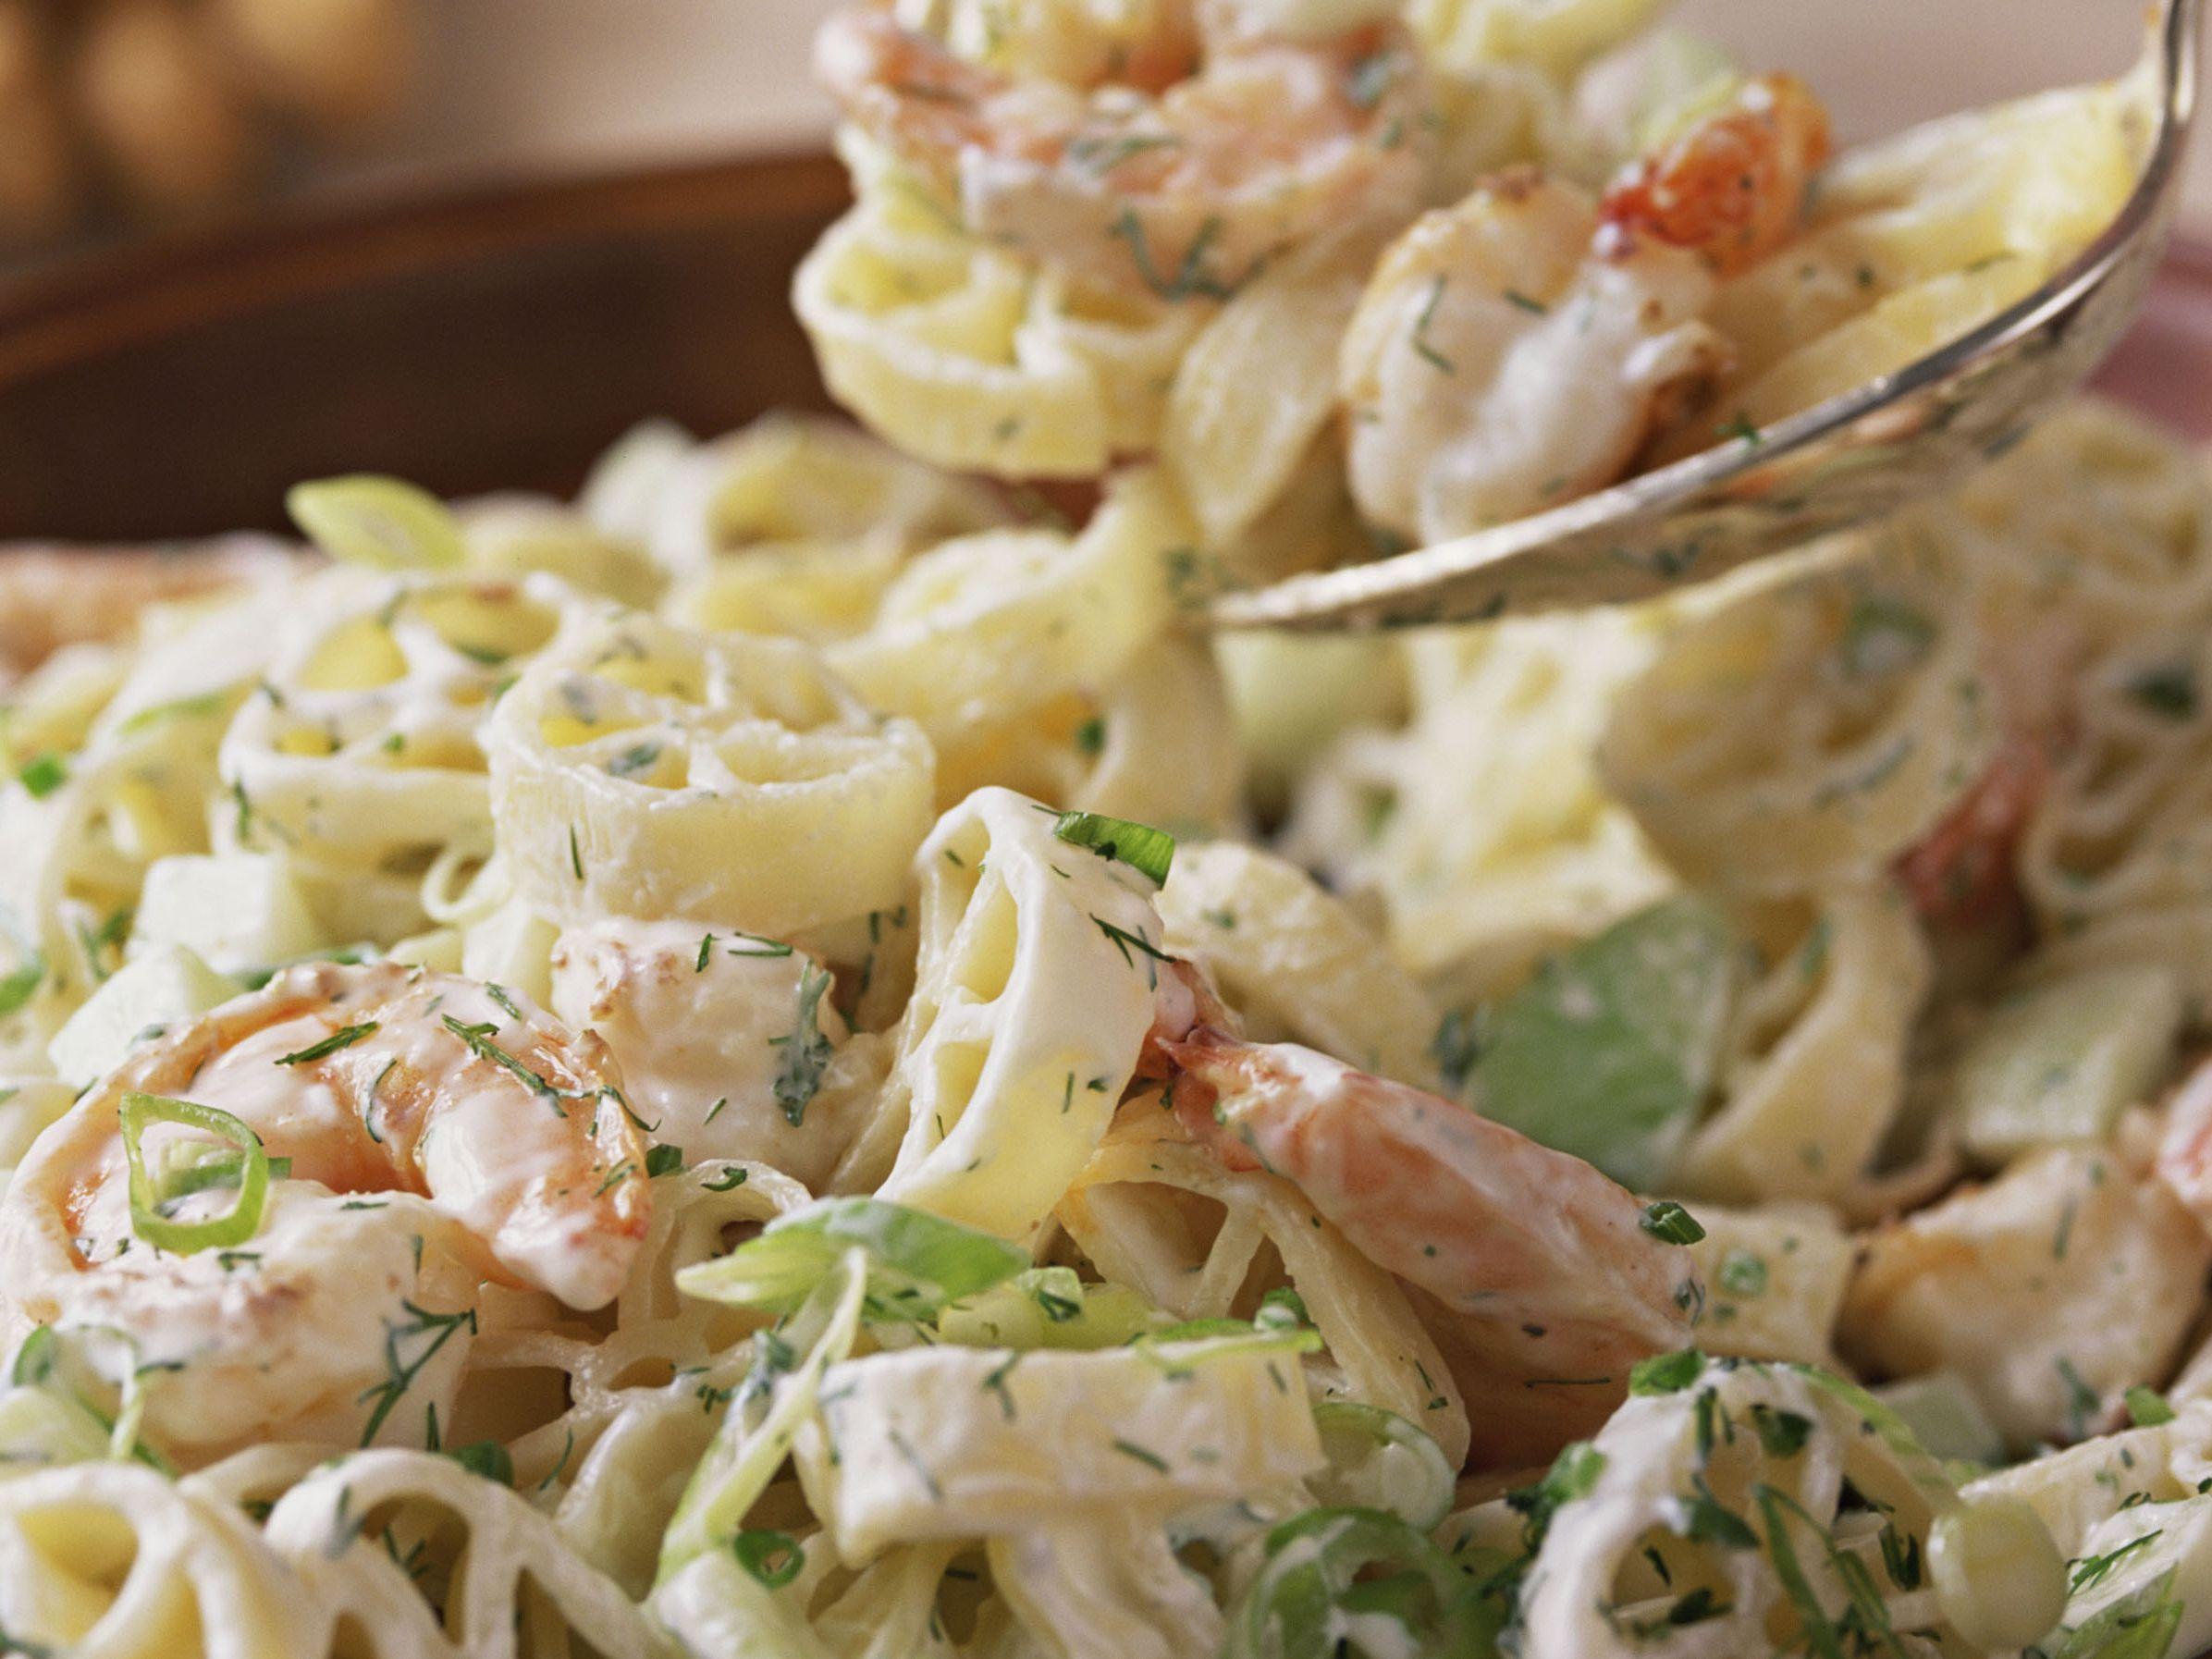 Shrimp And Macaroni Pasta Salad Recipe